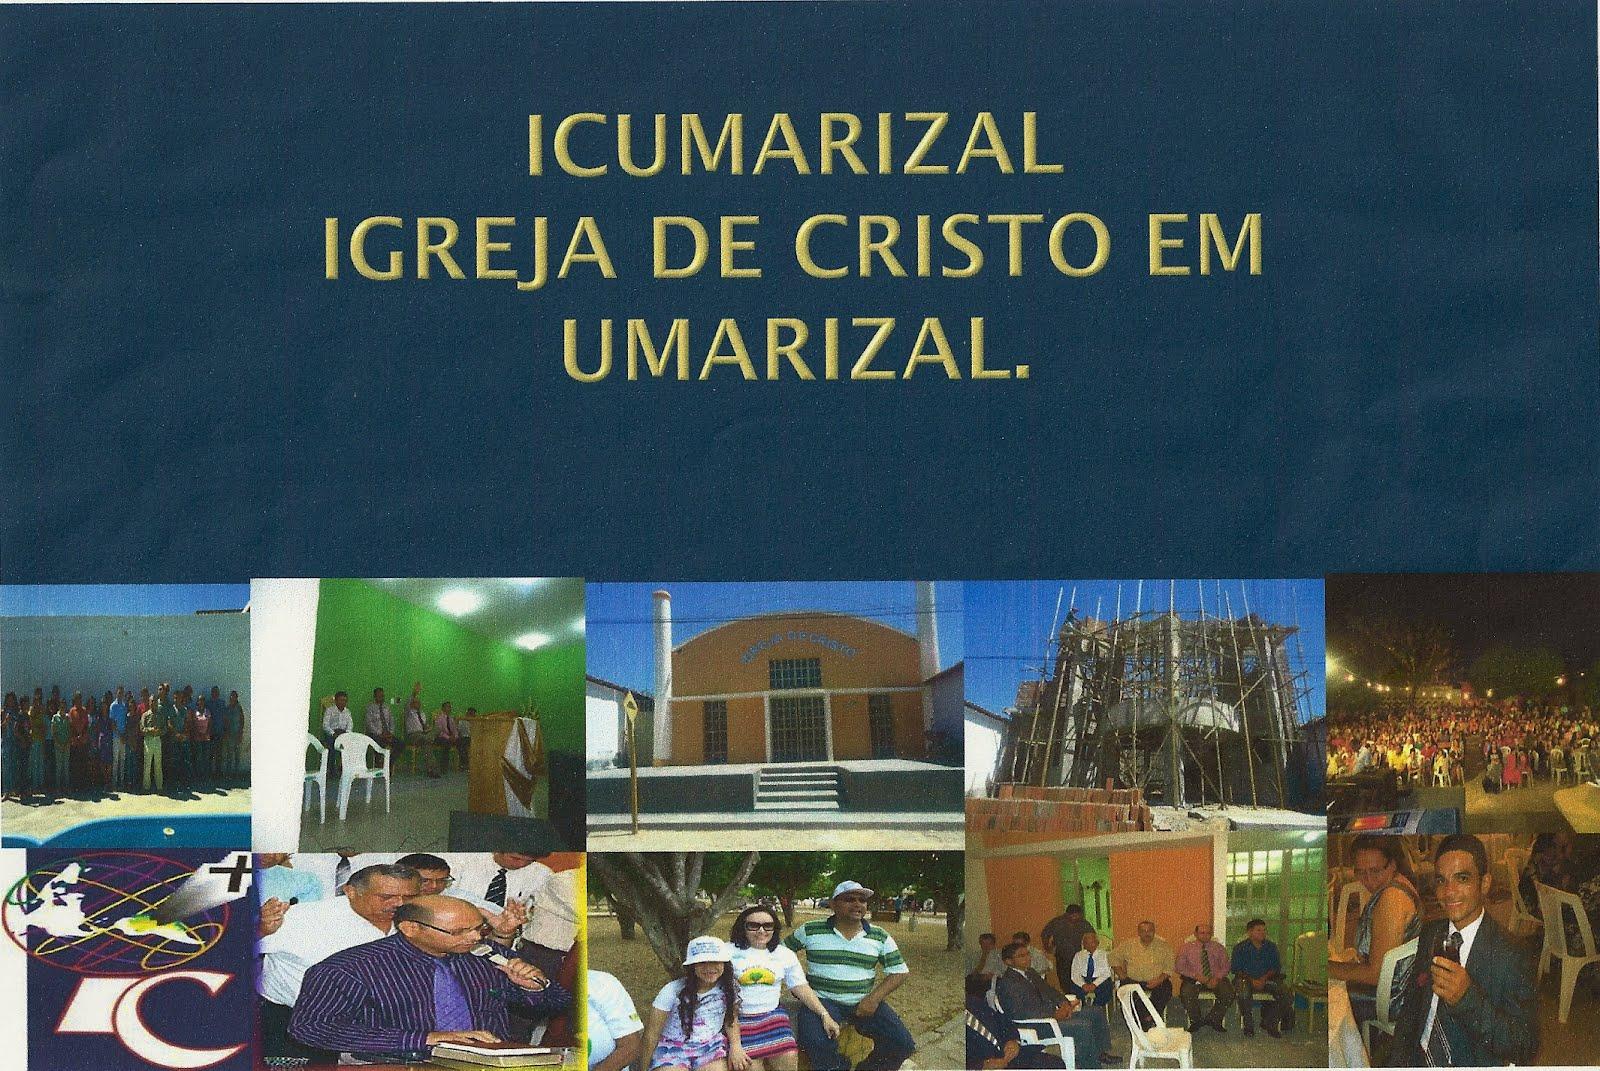 ICUMARIZAL